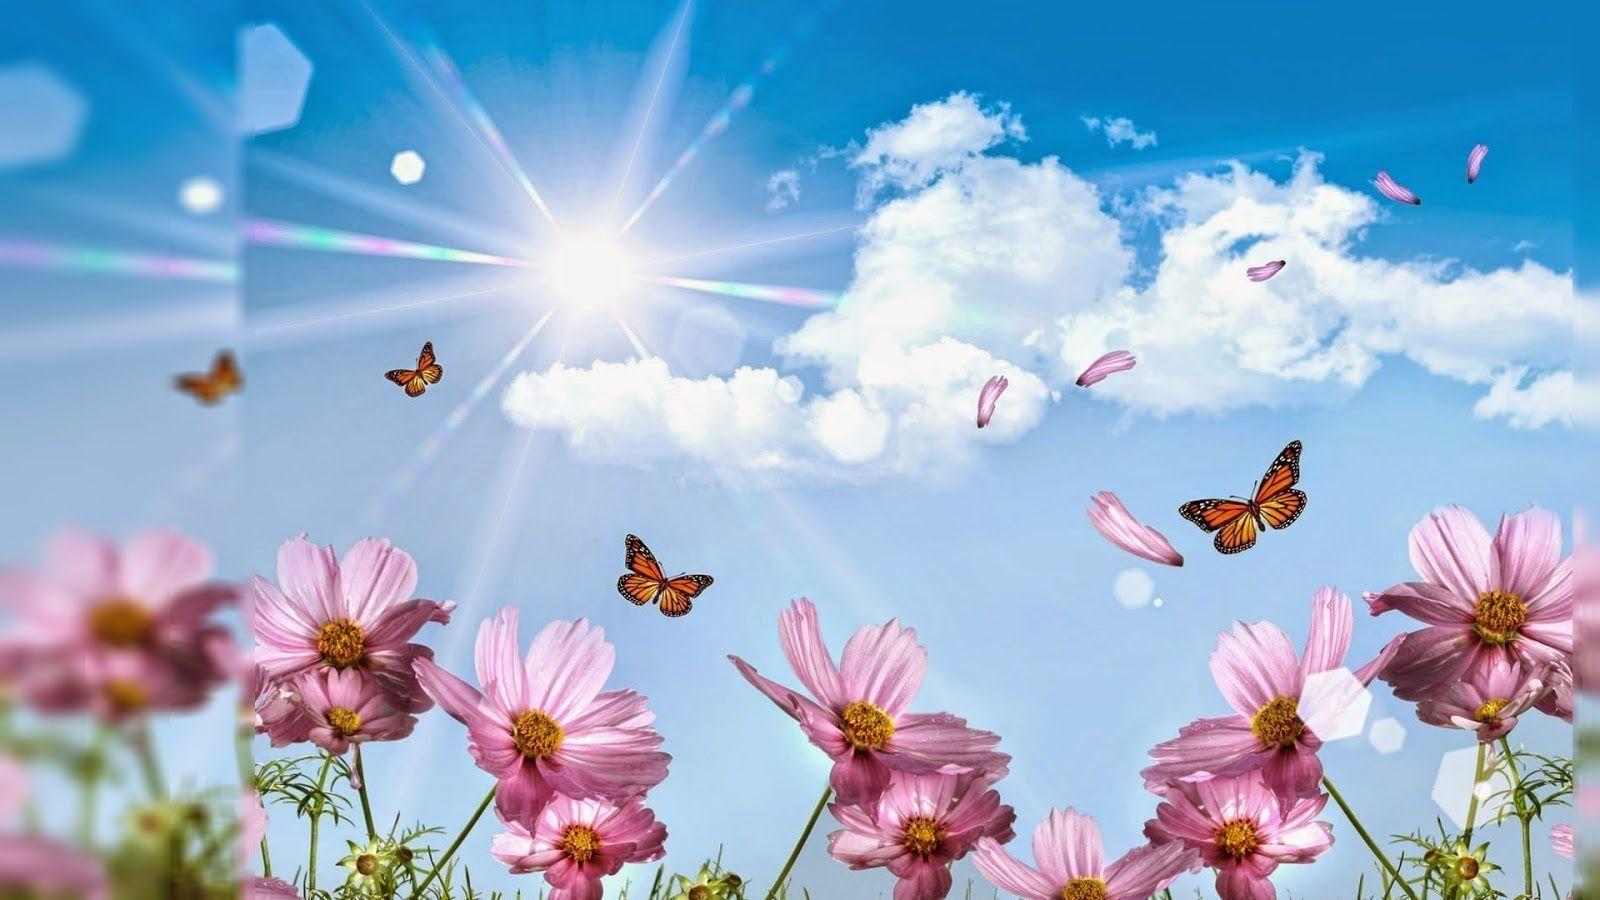 Pin By Kenda Davis 3 Peat On Home Style Flower Desktop Wallpaper Desktop Wallpapers Backgrounds Nature Wallpaper